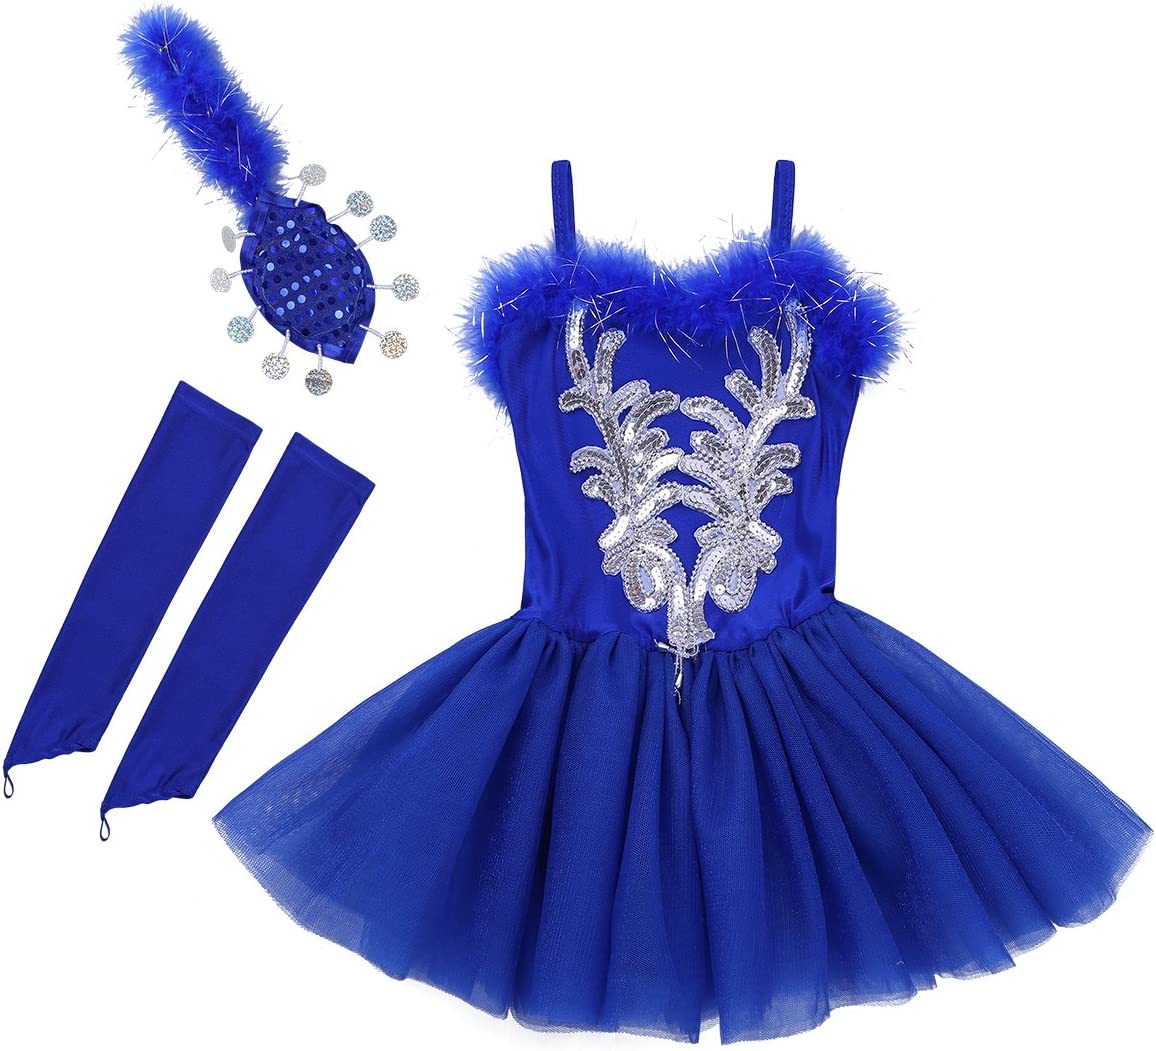 iiniim Toddler Girls Cotton Glitter Camisole Ballet Tutu Leotard Dancing Dress 4-12 Years